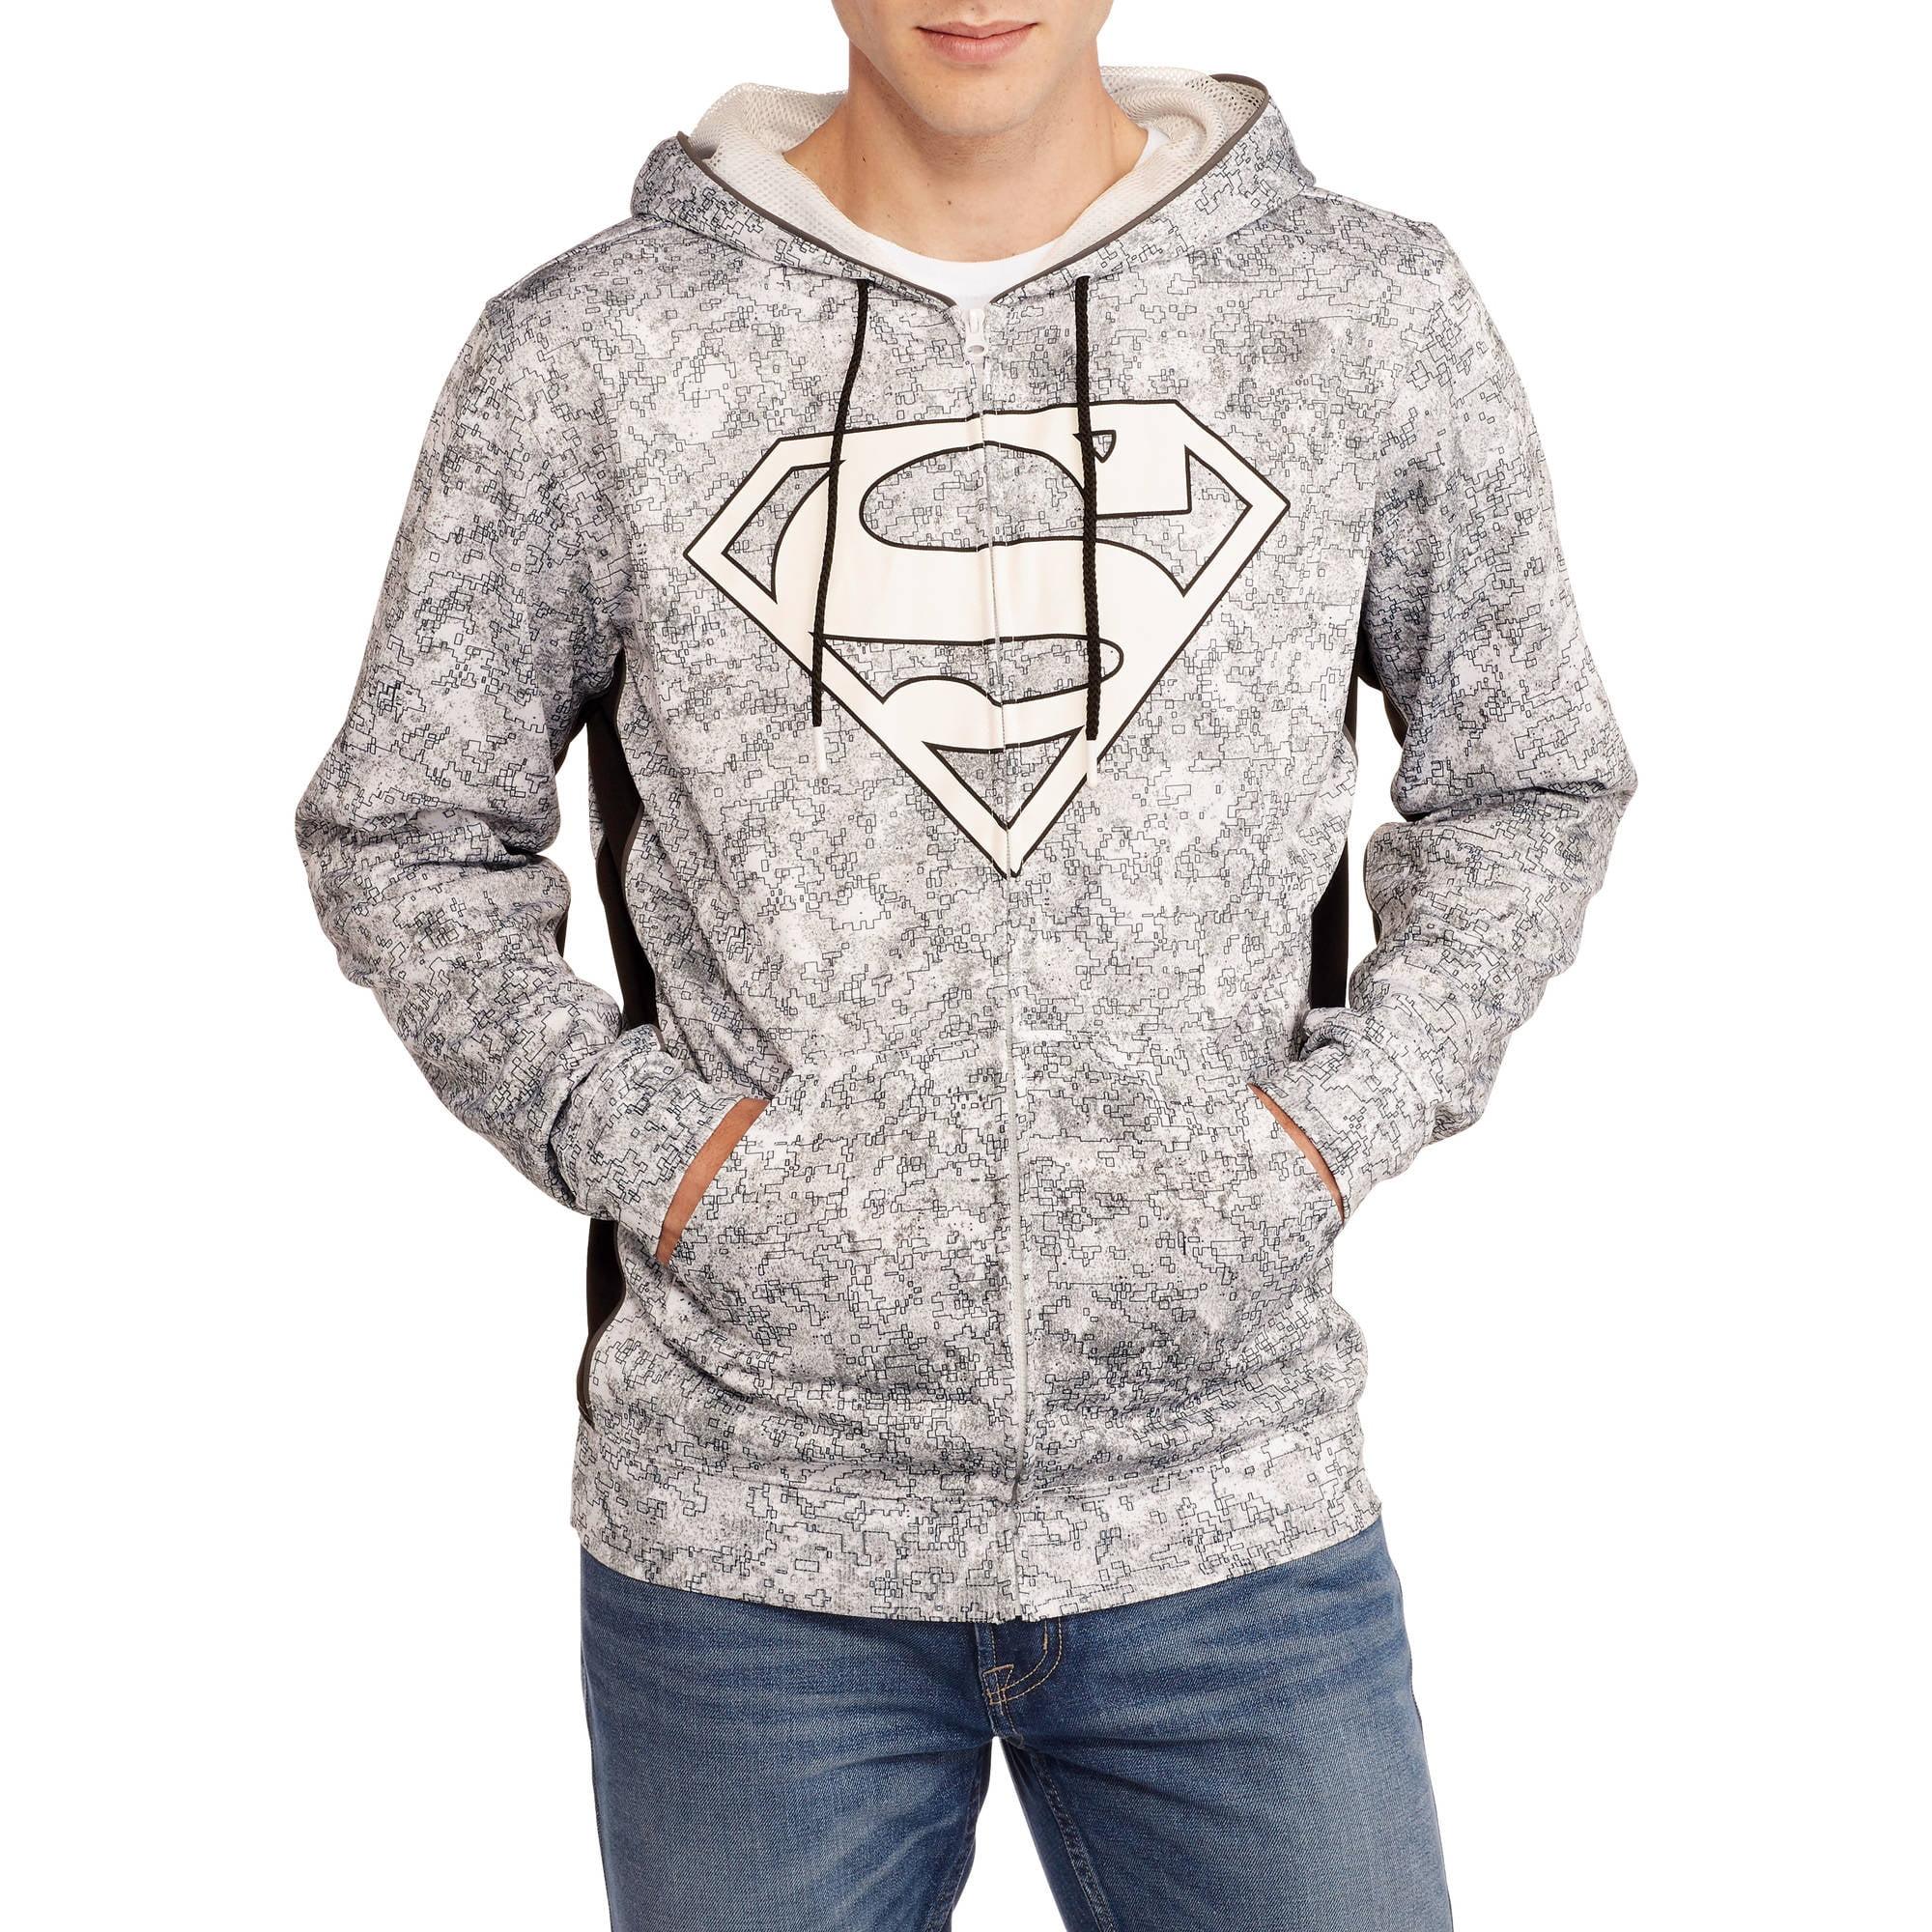 Superman Big Men's Sublimated Applique Shield Poly Hoodie, 2XL